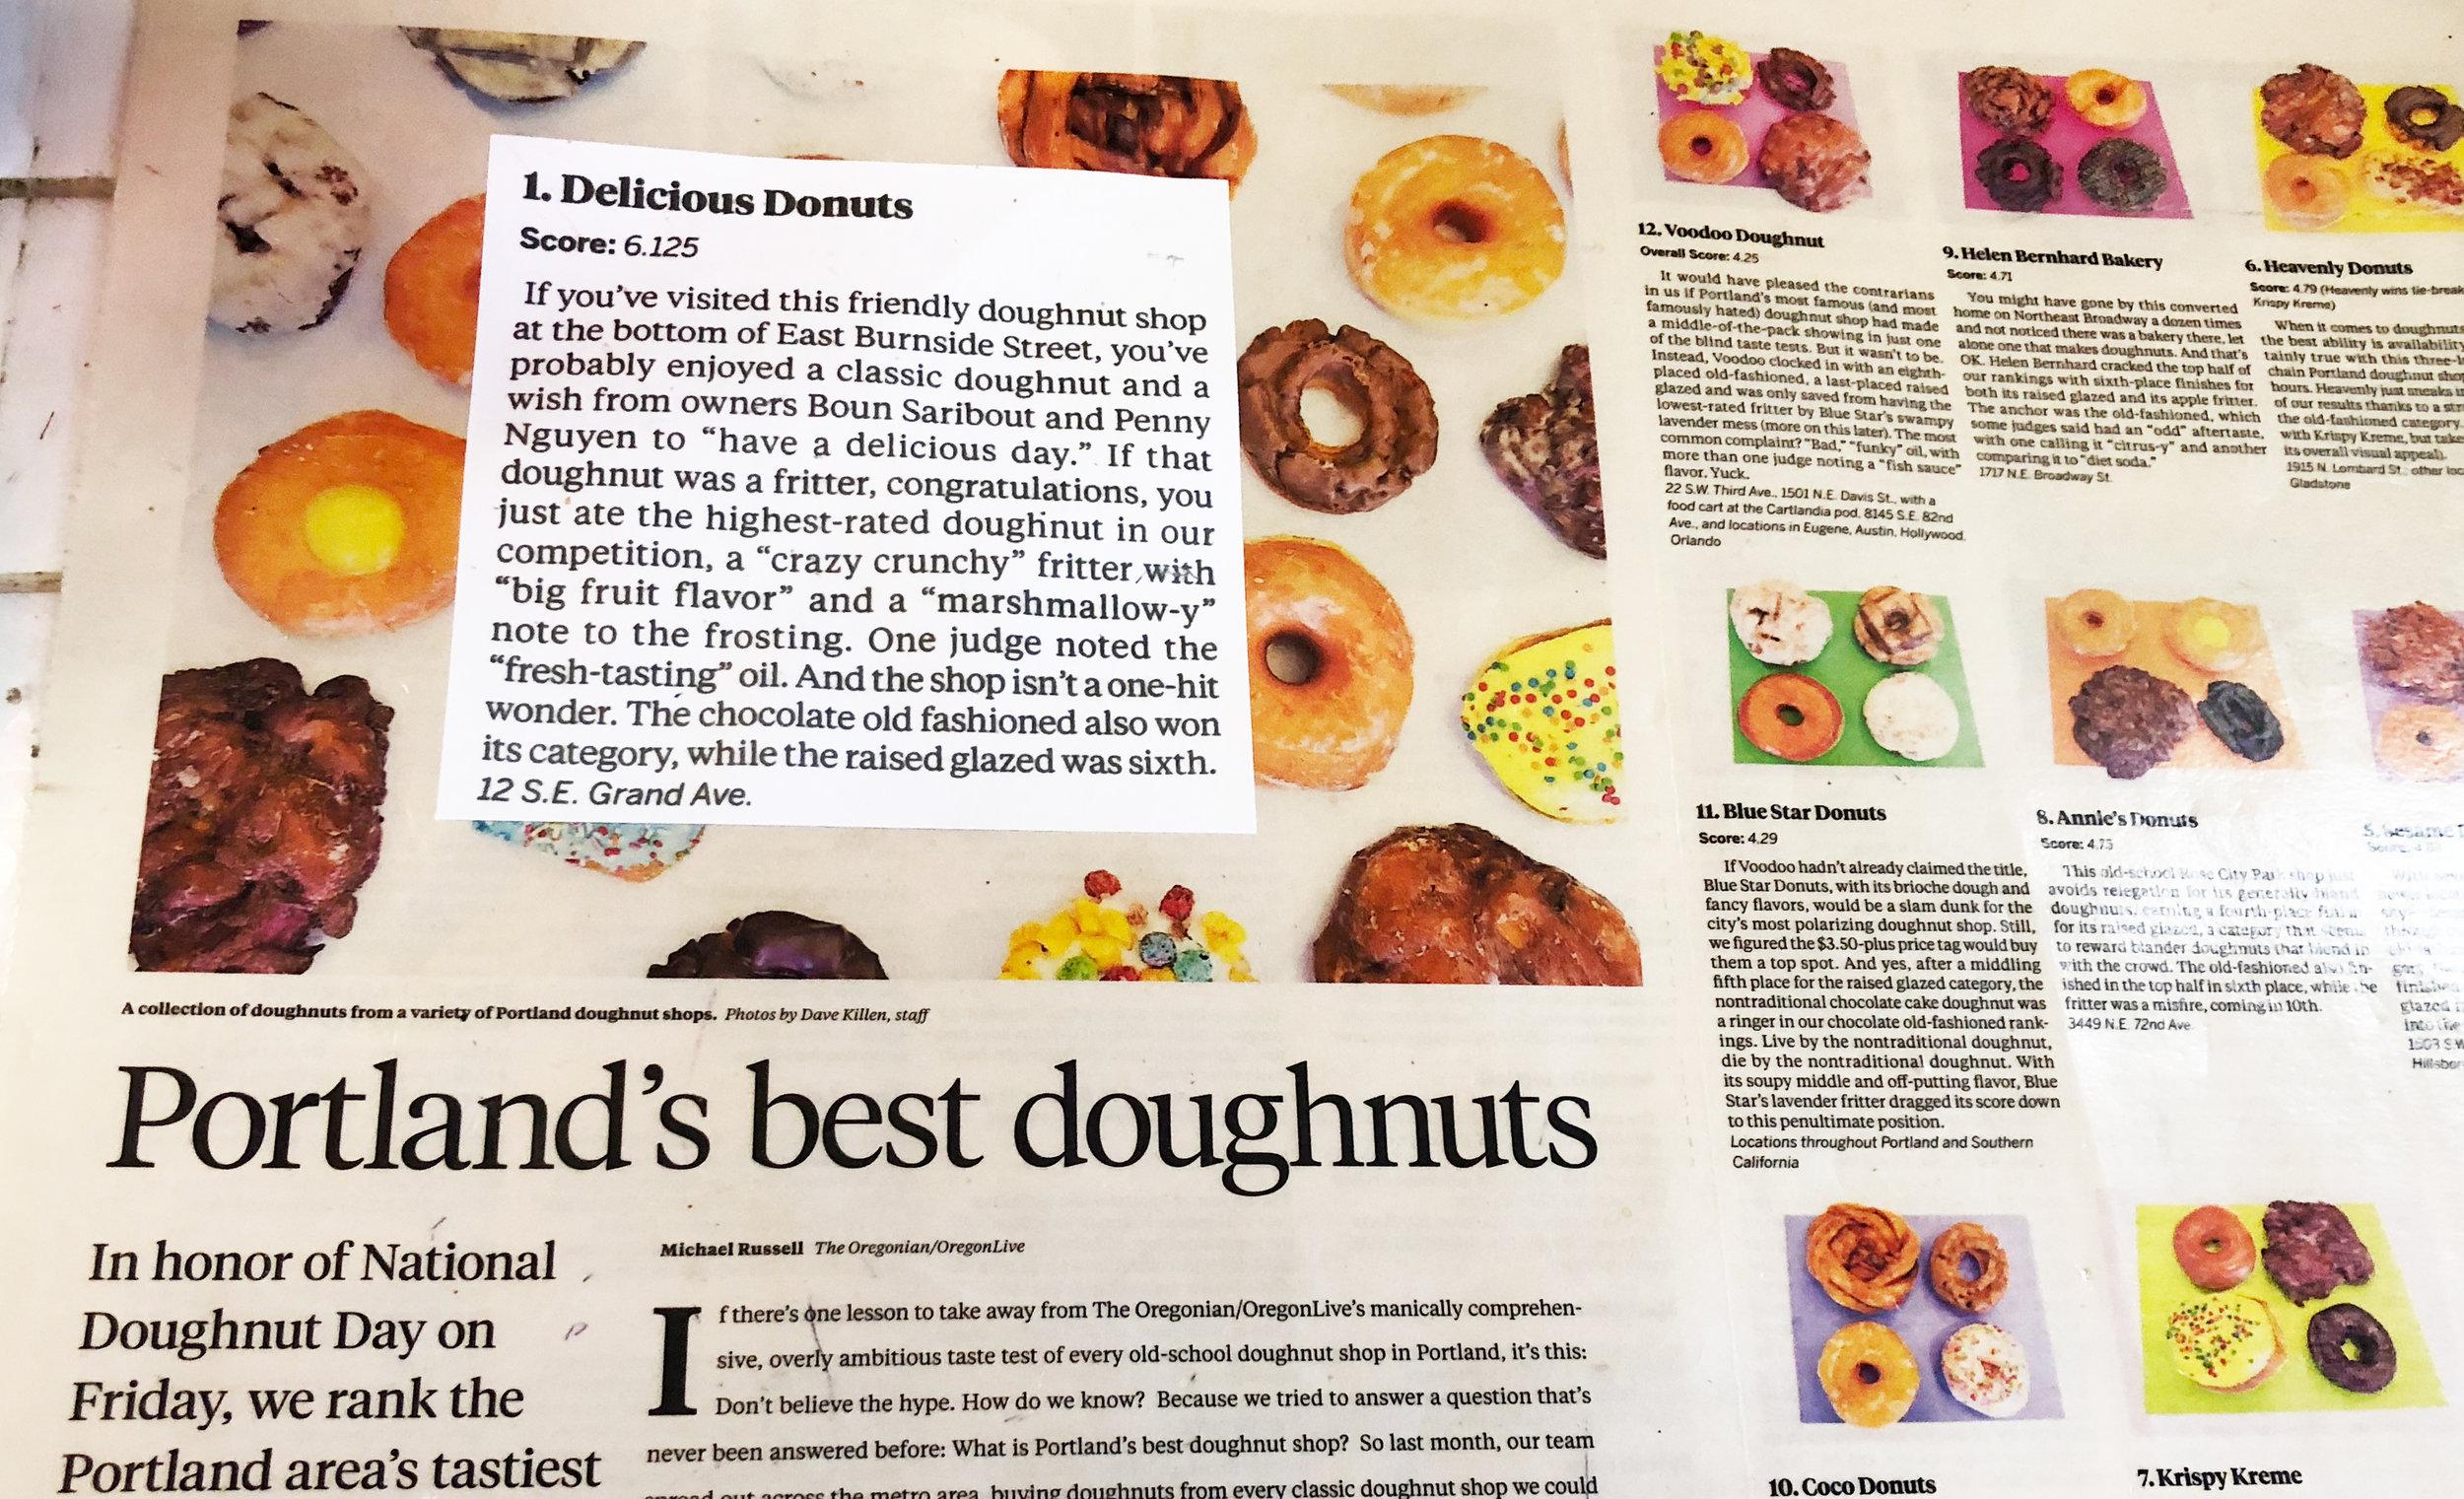 Delicious Donuts - News clipping - Nathaniel Barber Blog